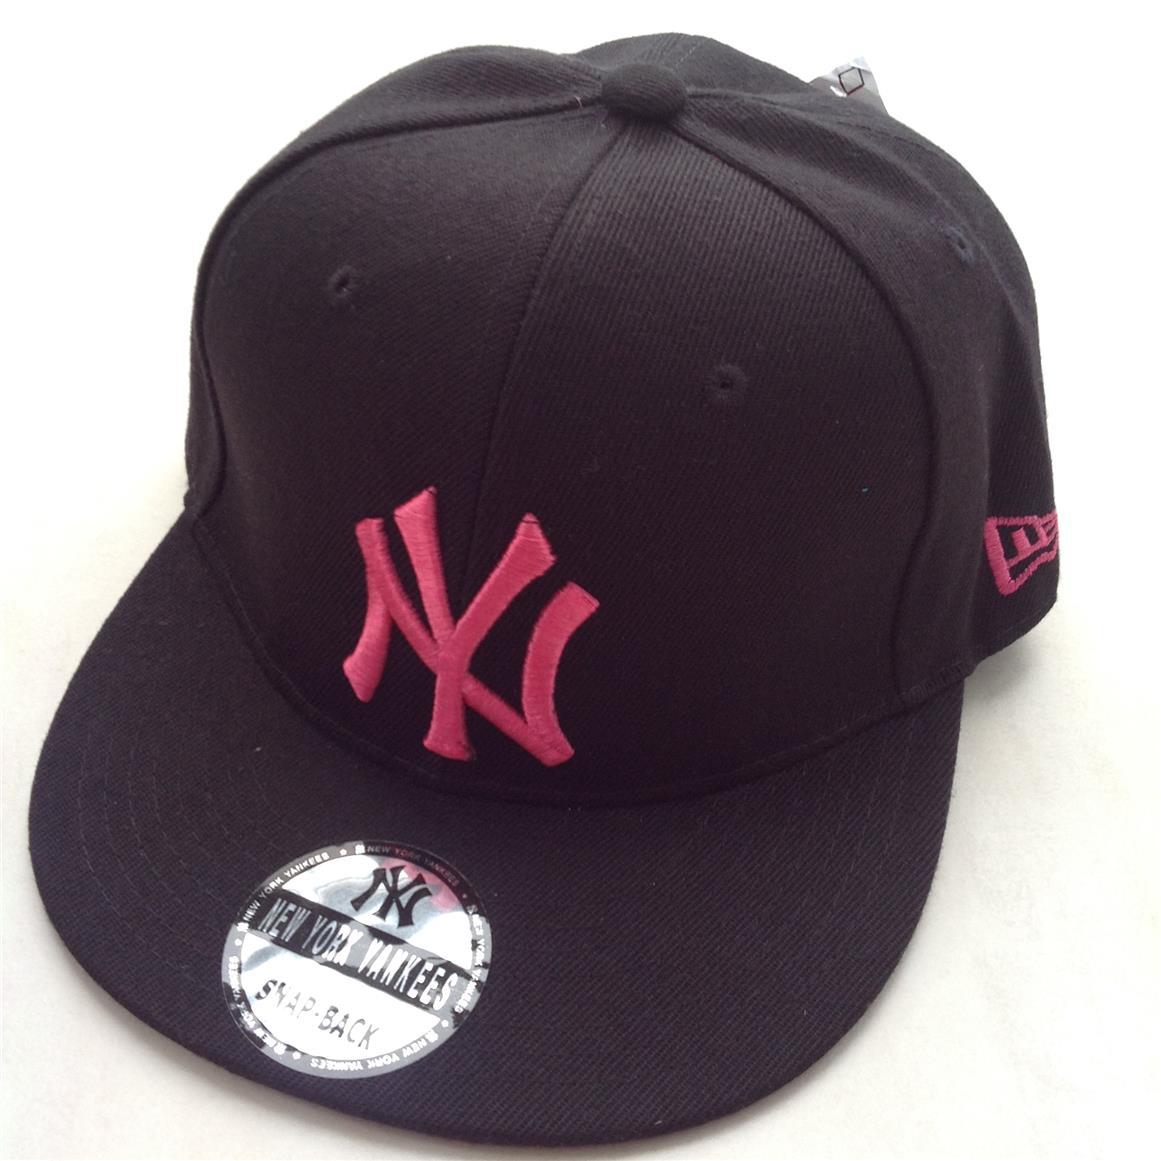 Product Description. New York Yankees Snapback Hip Hop Baseball Caps - Black 6462fc3ebe6